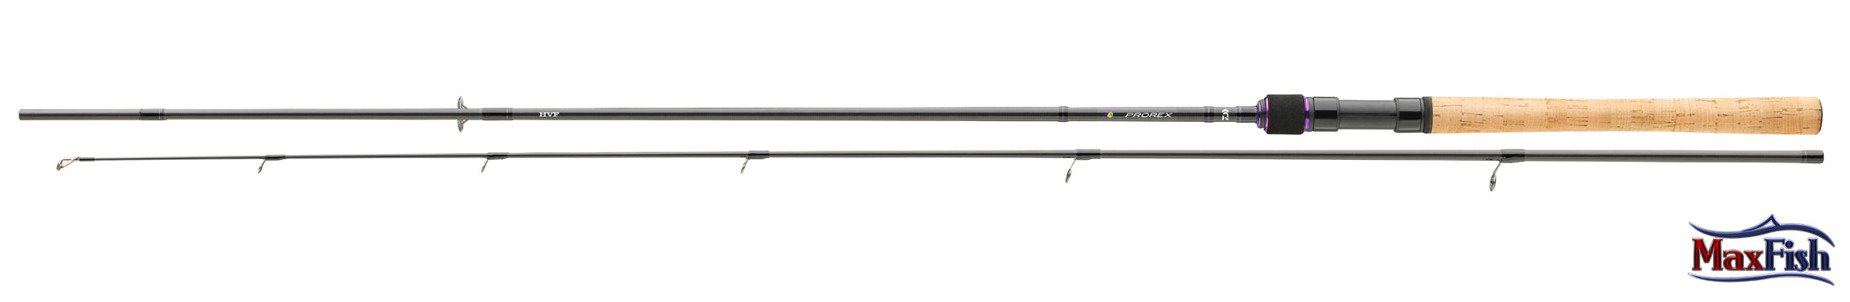 Daiwa Prorex S Light Spin  225cm 3-14g